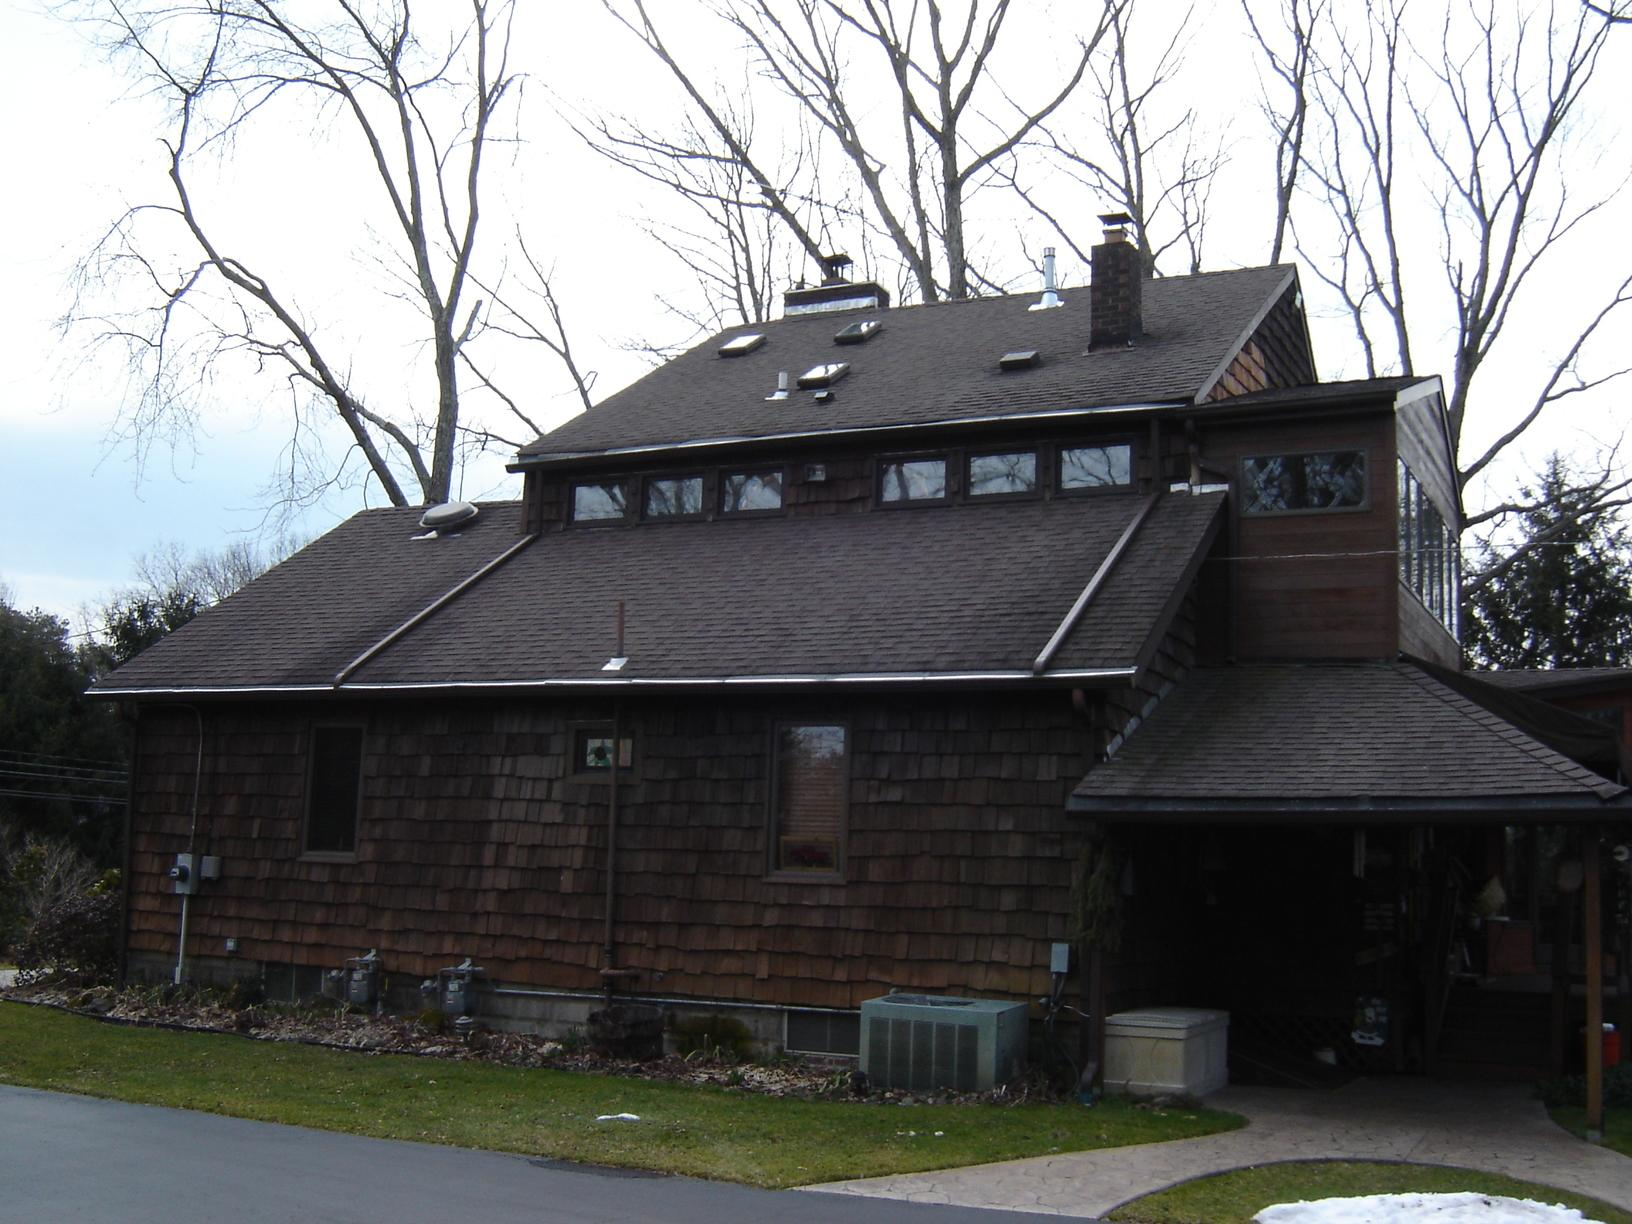 Burgundy Drexel Standing Seam Metal Roof Installation in Jackson, NJ - Before Photo